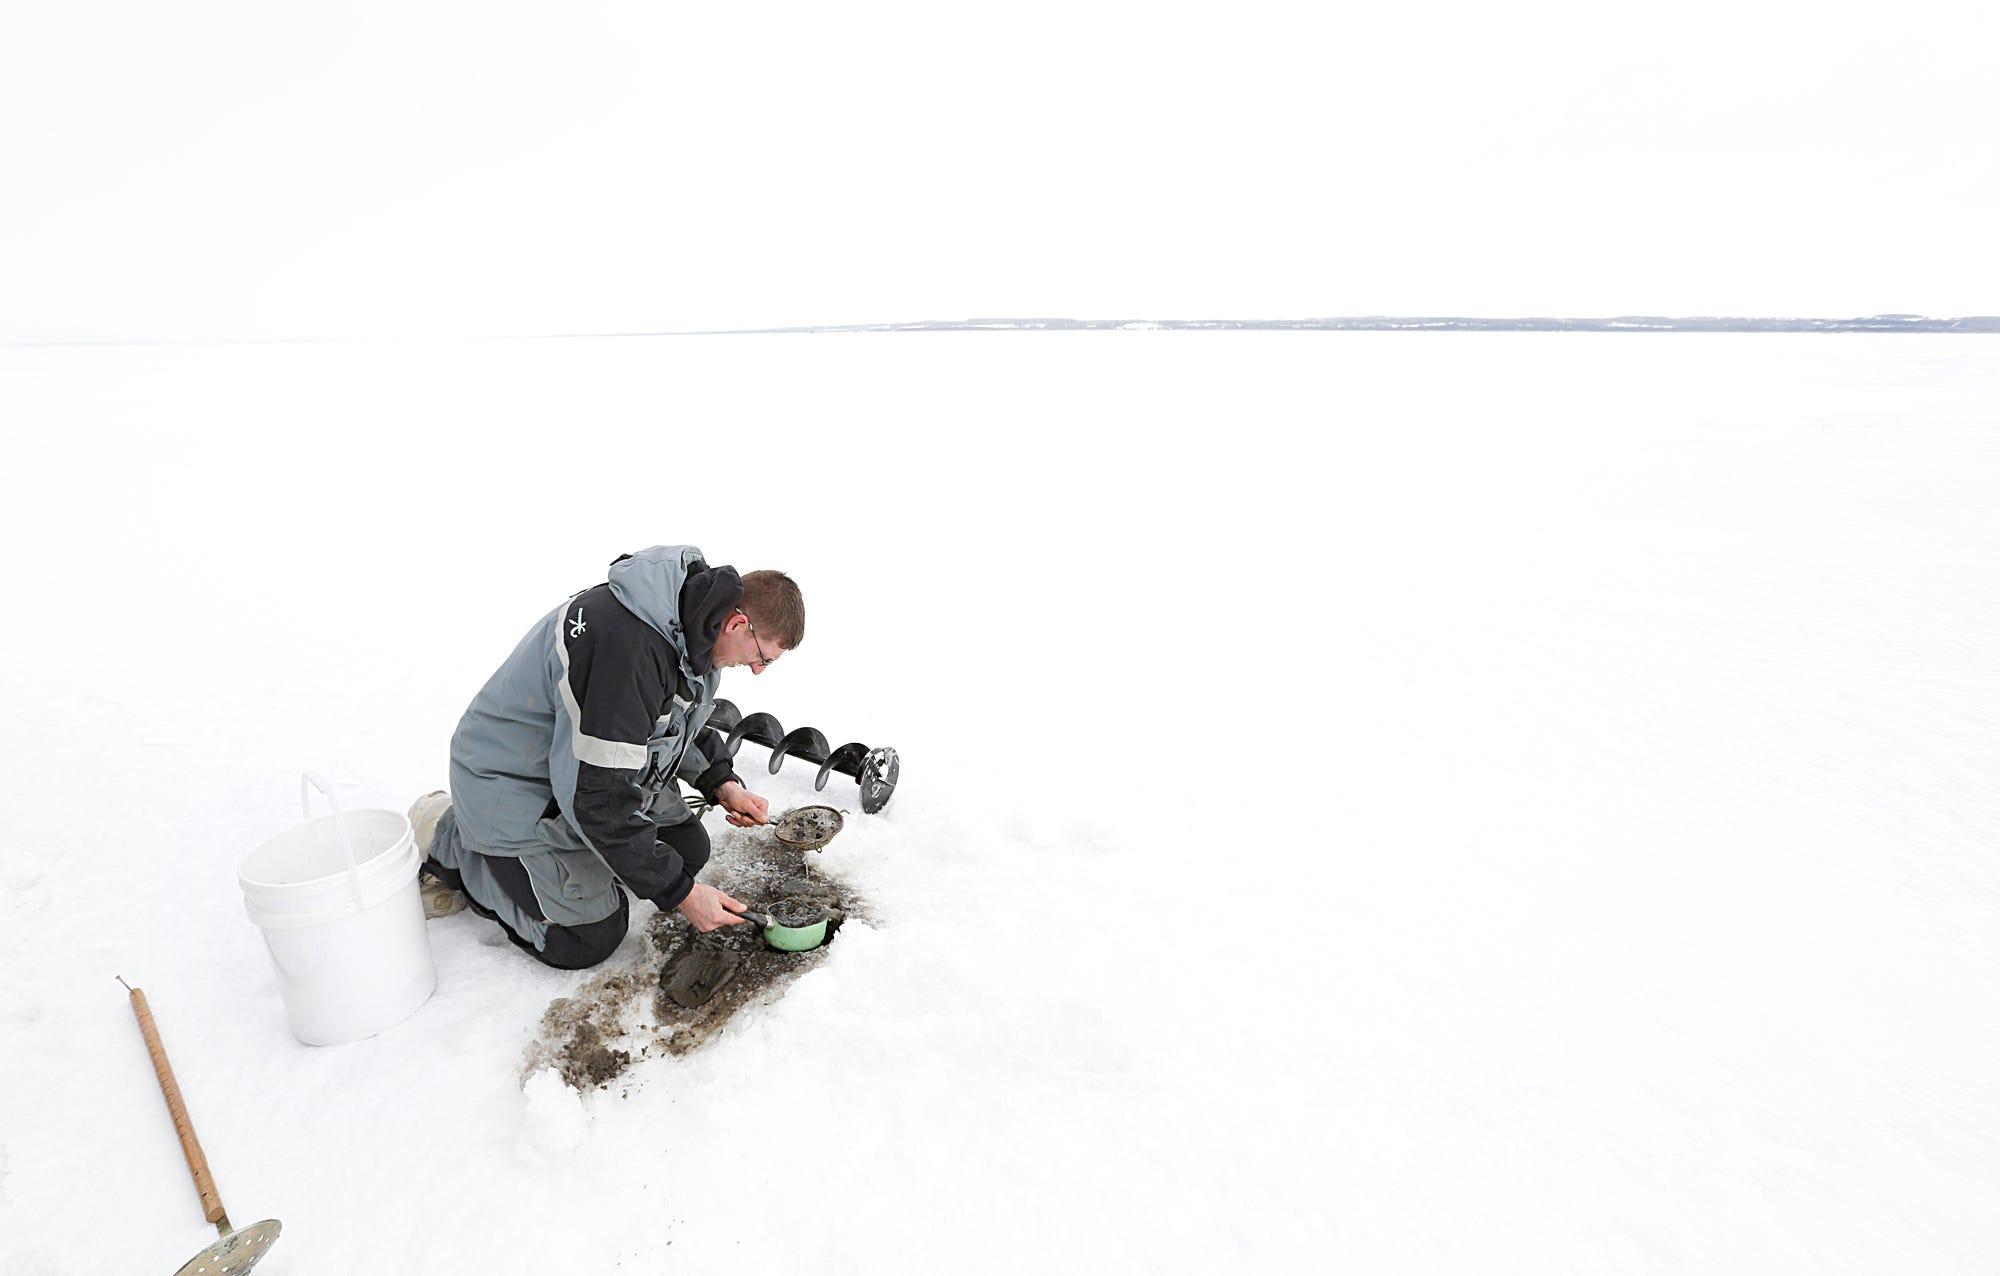 Getting ready for sturgeon spearing on Lake Winnebago